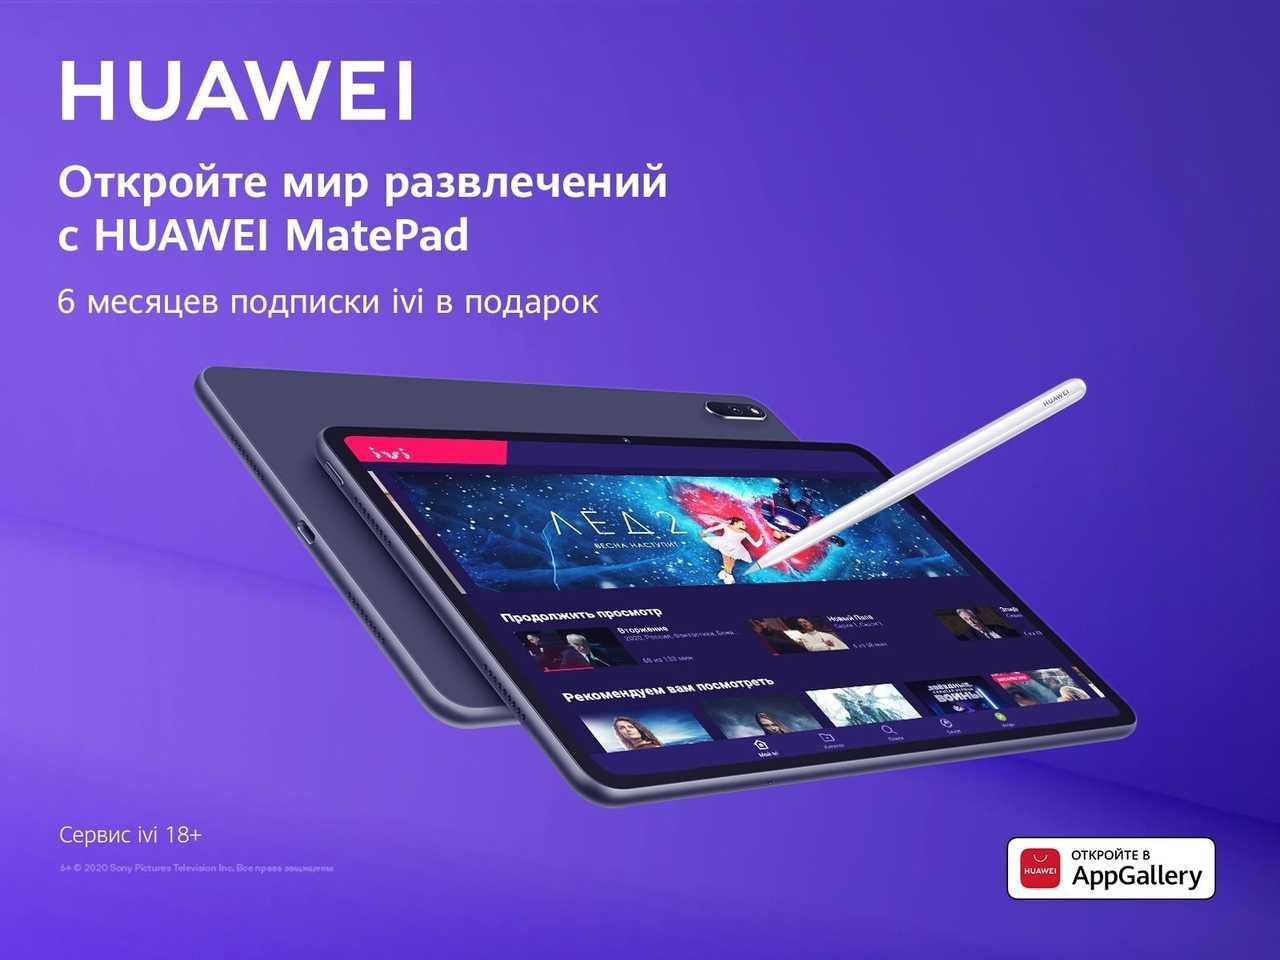 На шаг ближе к ноутбукам: обзор планшета huawei matepad pro — рт на русском